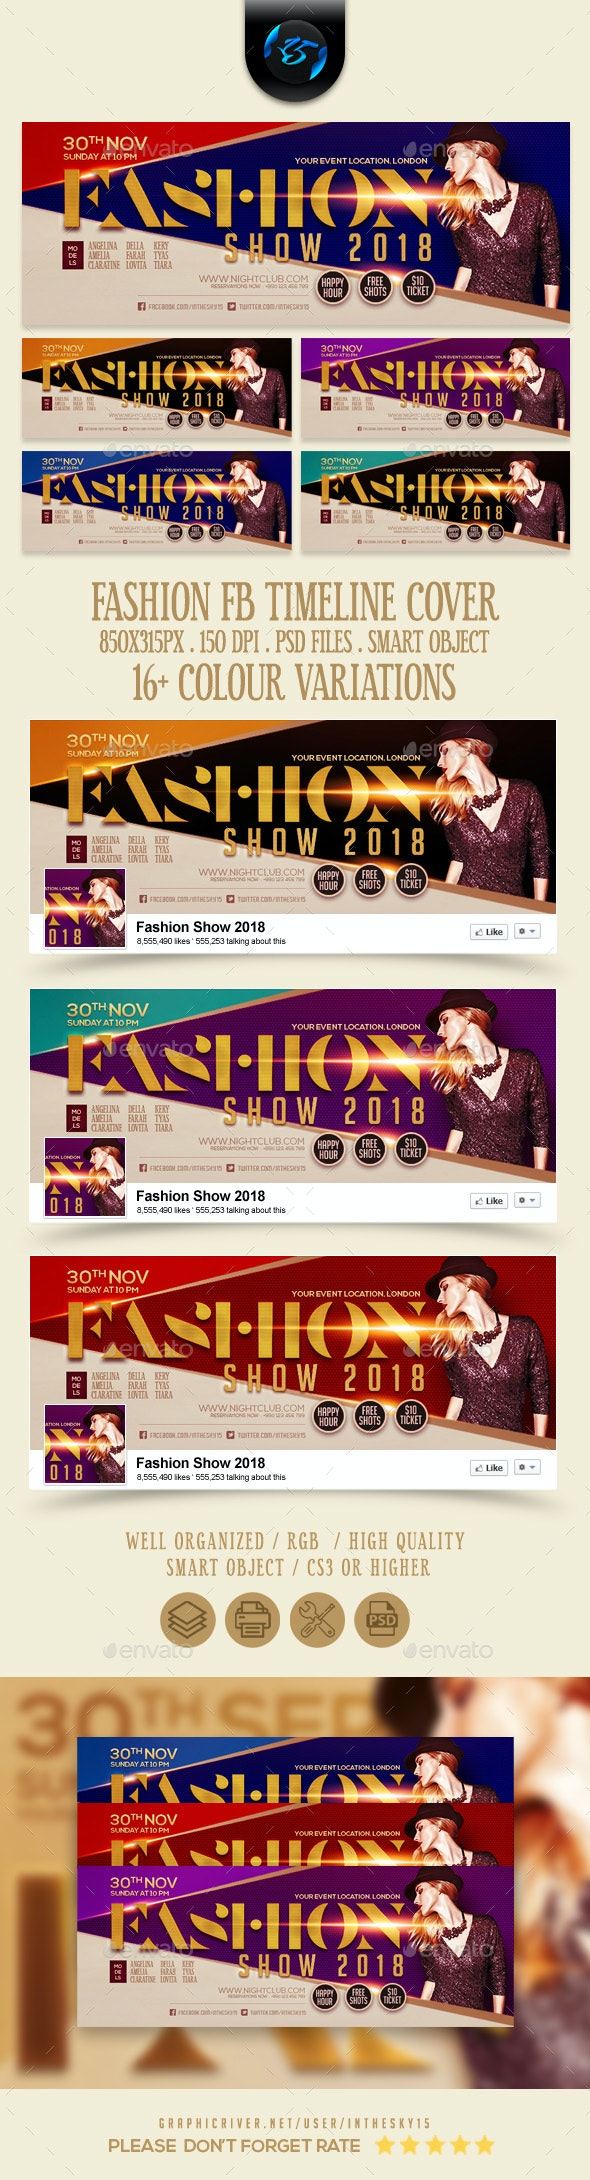 Fashion FB Timeline Cover - Facebook Timeline Covers Social Media